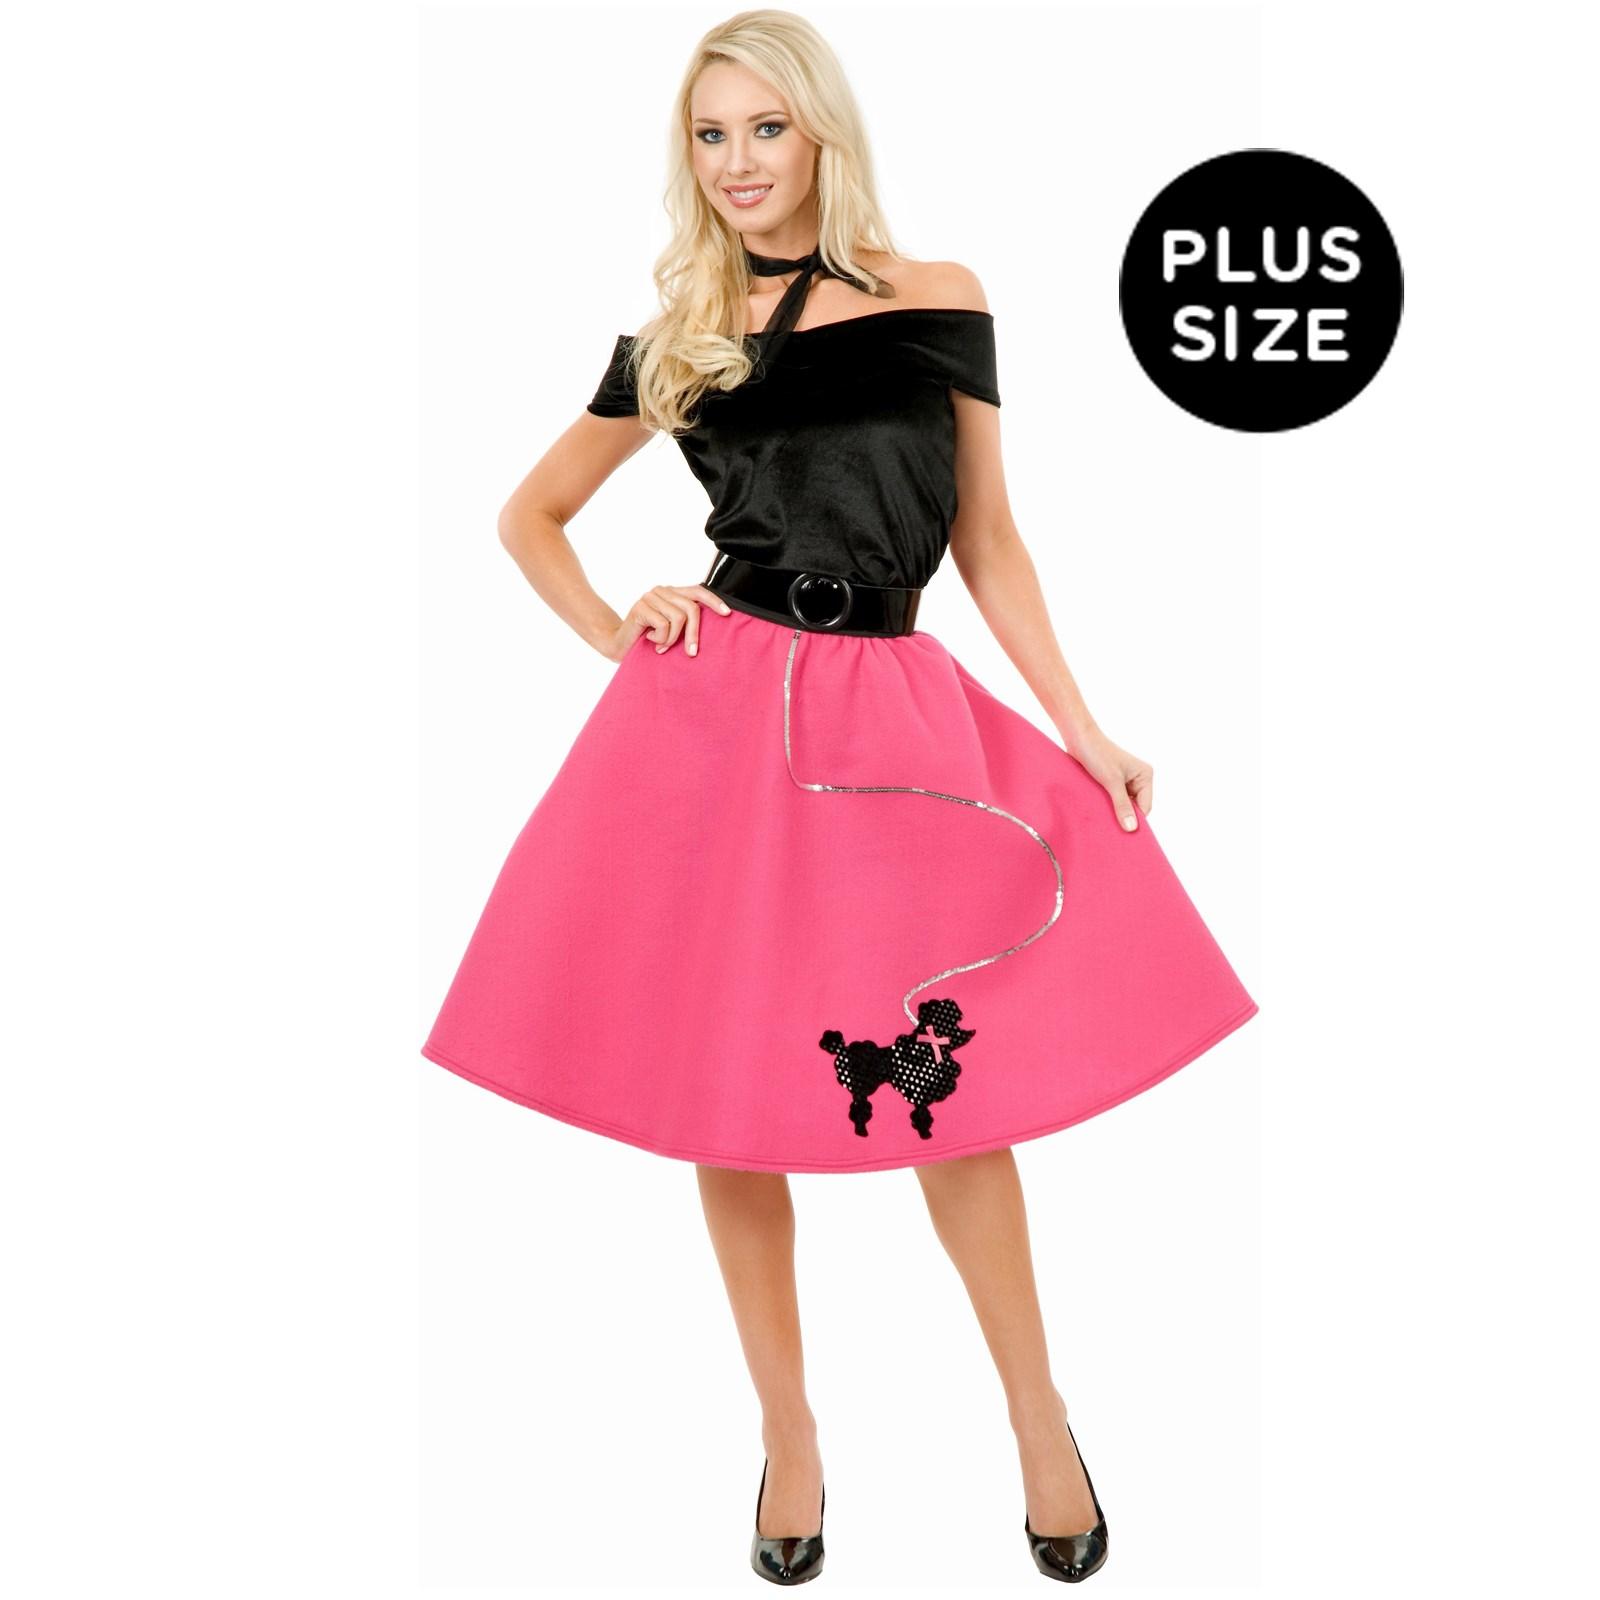 Poodle Skirt Top Scarf Adult Plus Costume